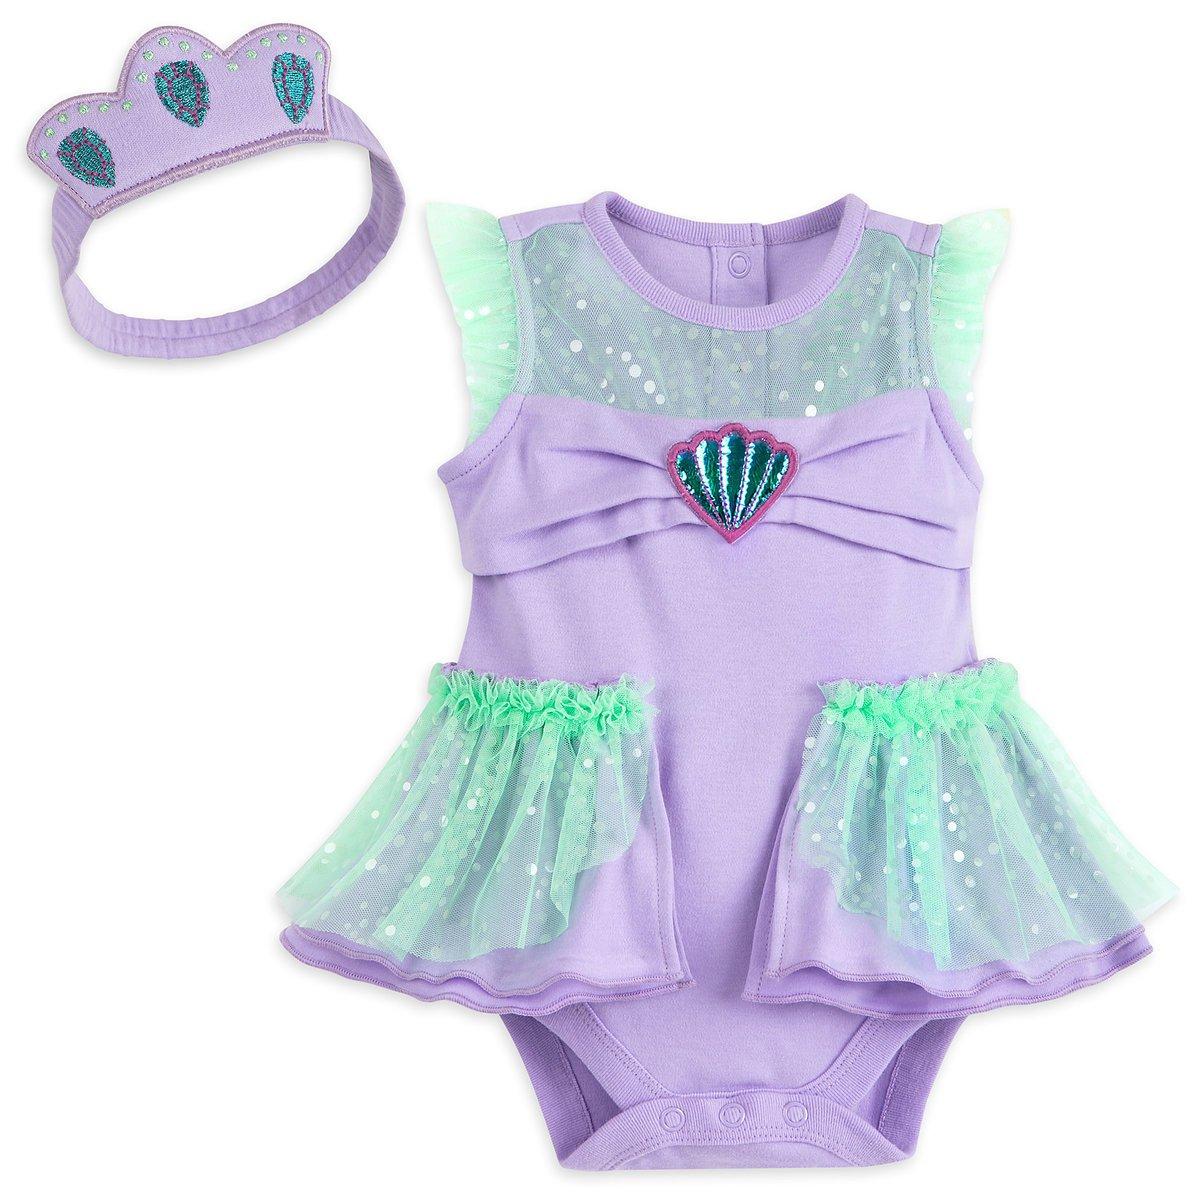 Disney Store Ariel Baby Bodysuit Costume Headband The Little Mermaid 3-6 sold AZ 10/16/2021